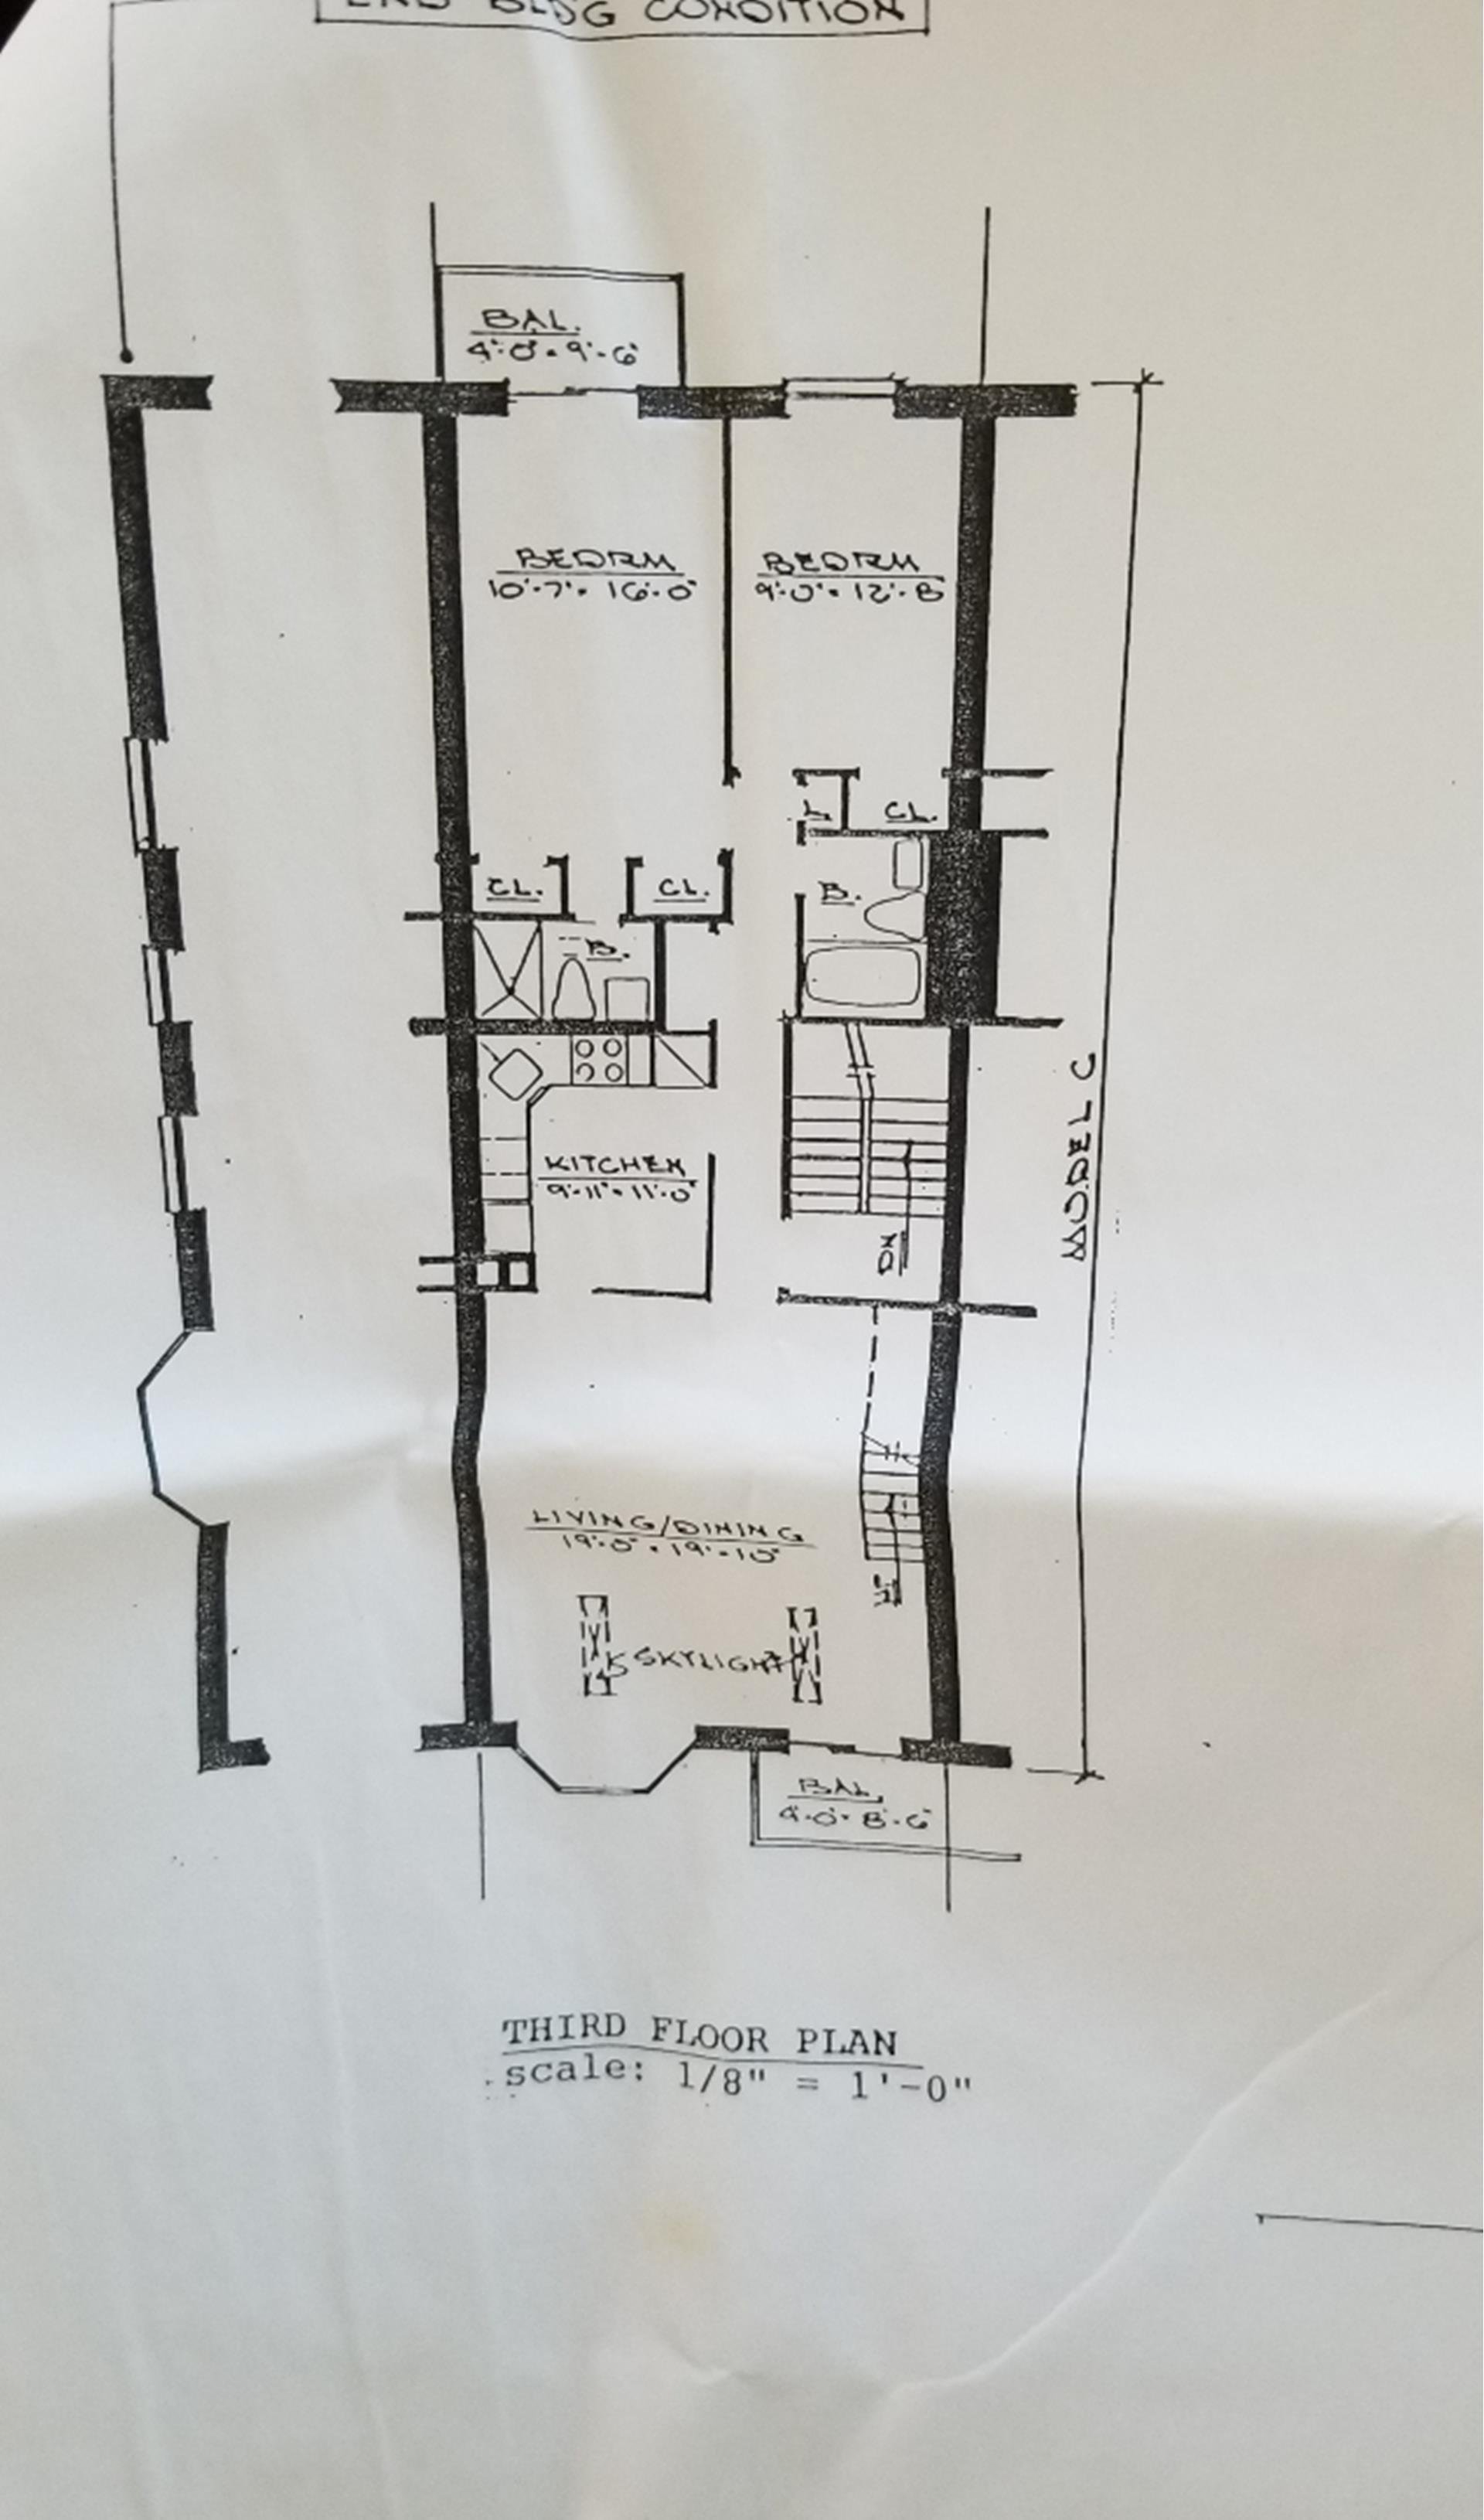 Floor plan of 15 Cove Ln, 3C - Georgetown, New York